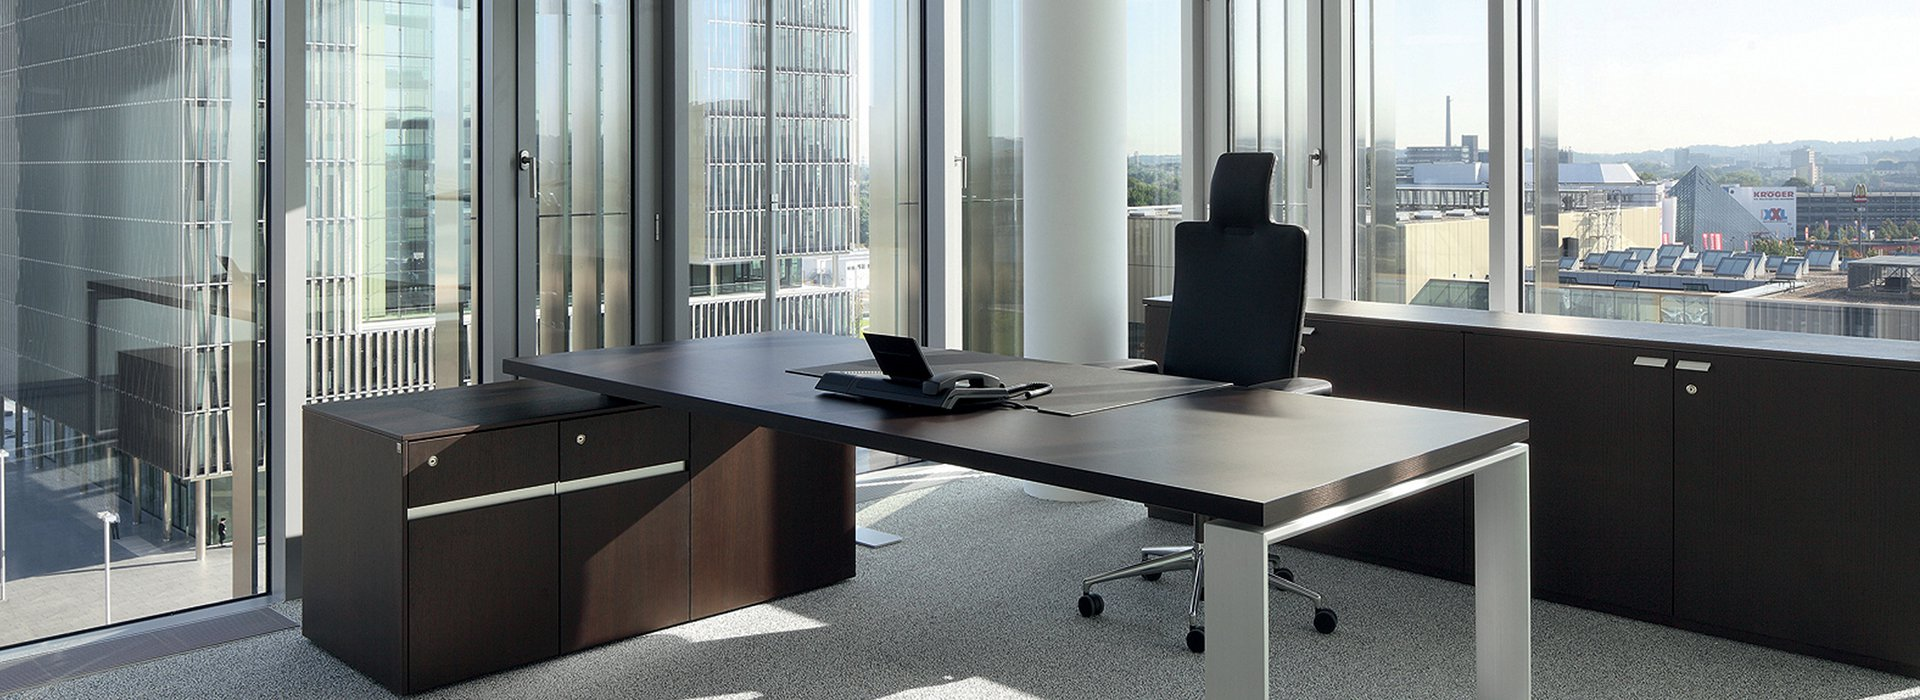 Moderne bürogestaltung  Bürogestaltung in München - S+W BüroRaumKultur GmbH